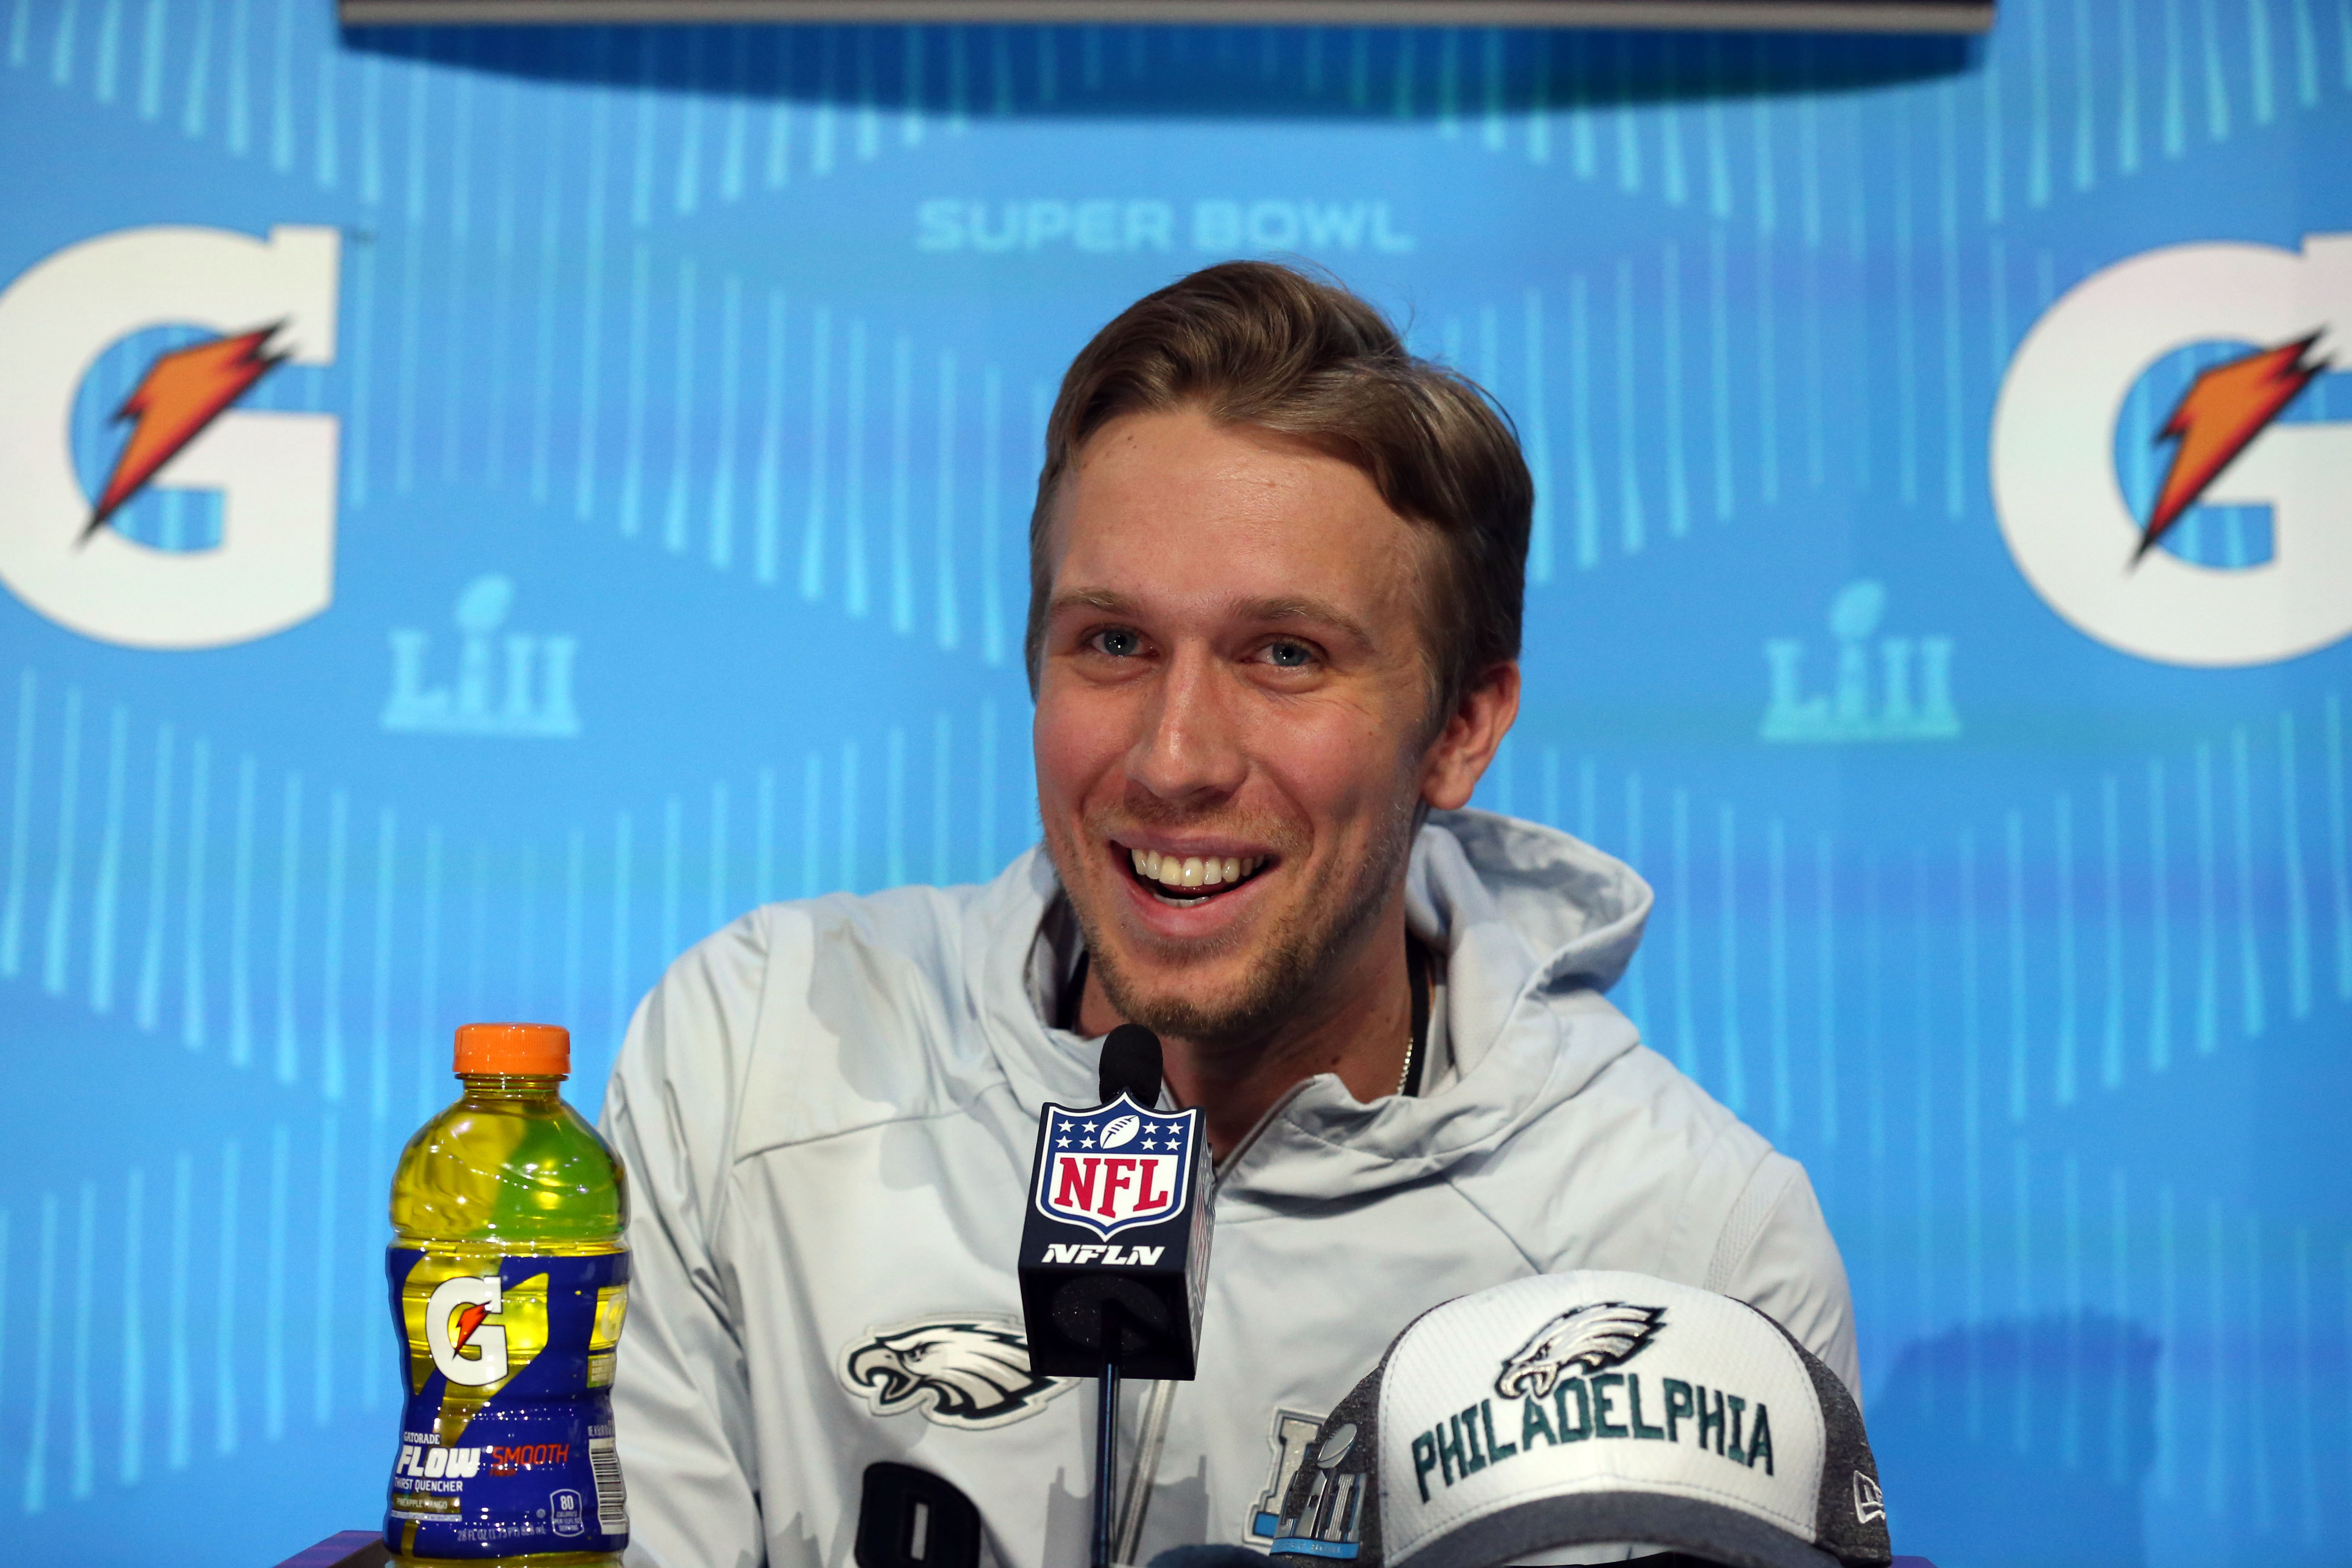 Nick Foles did not imagine he'd be starting QB in Super Bowl